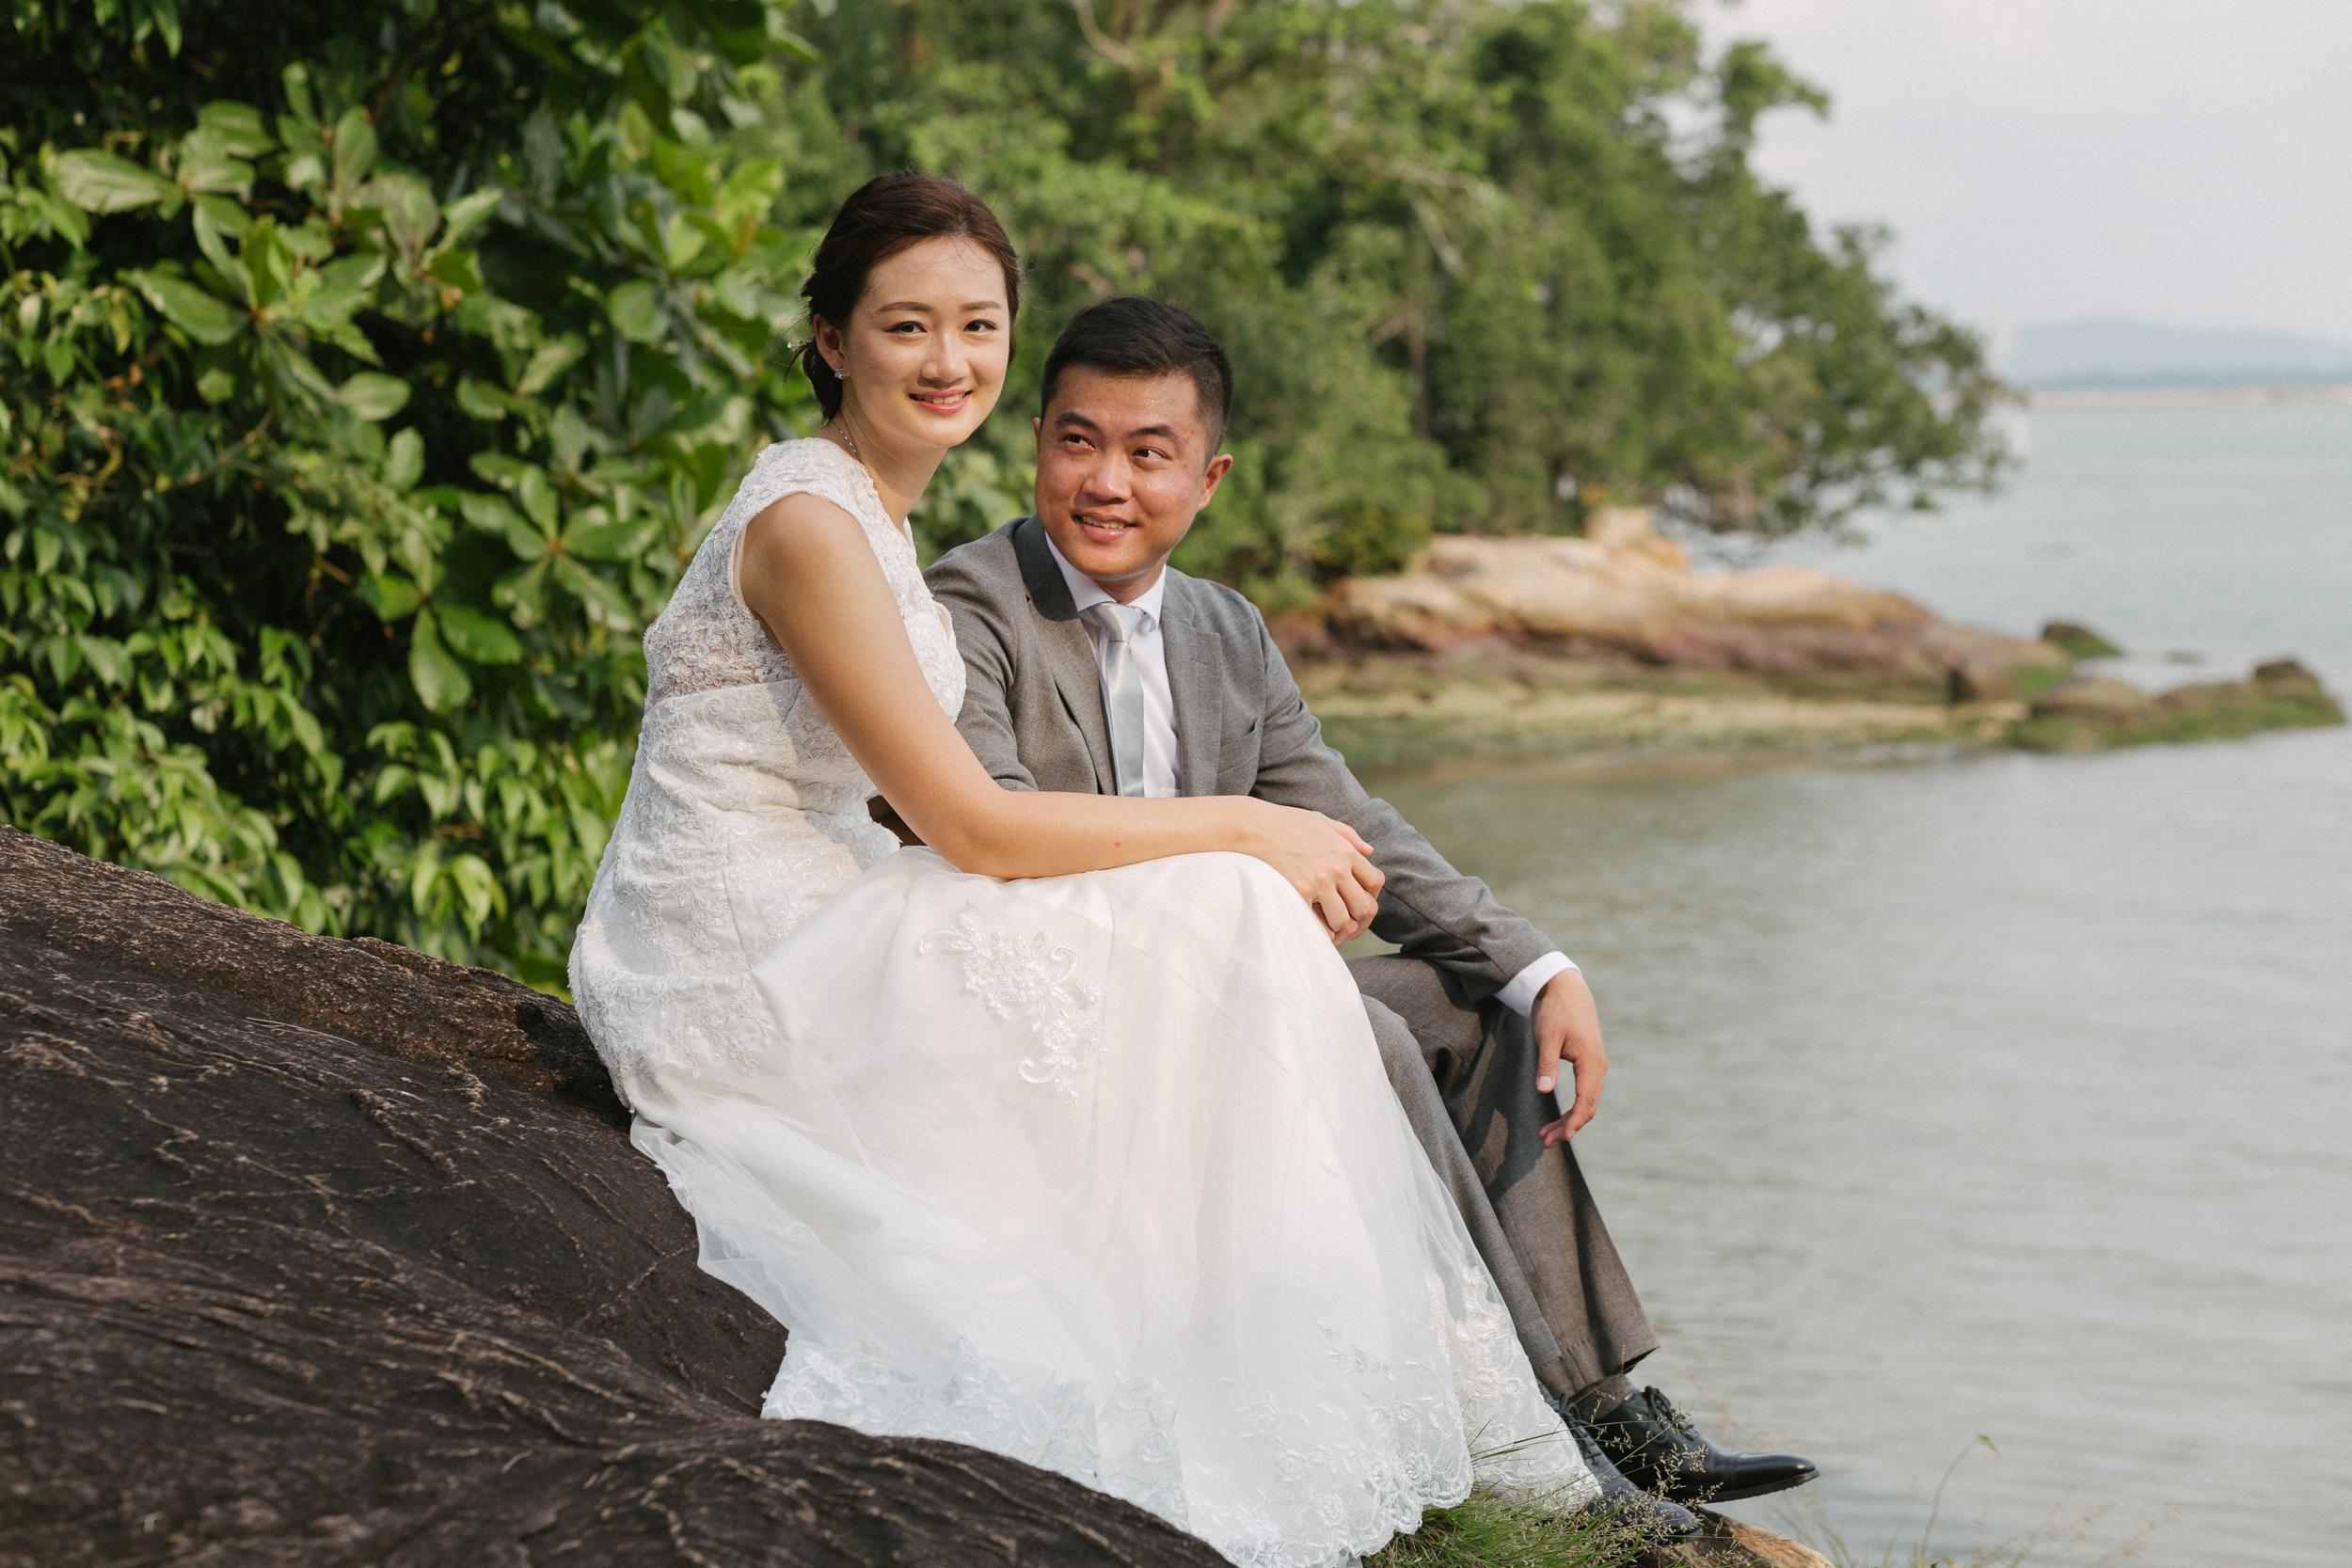 singapore-wedding-photographer-wemadethese-junekit-kingslin-06.jpg